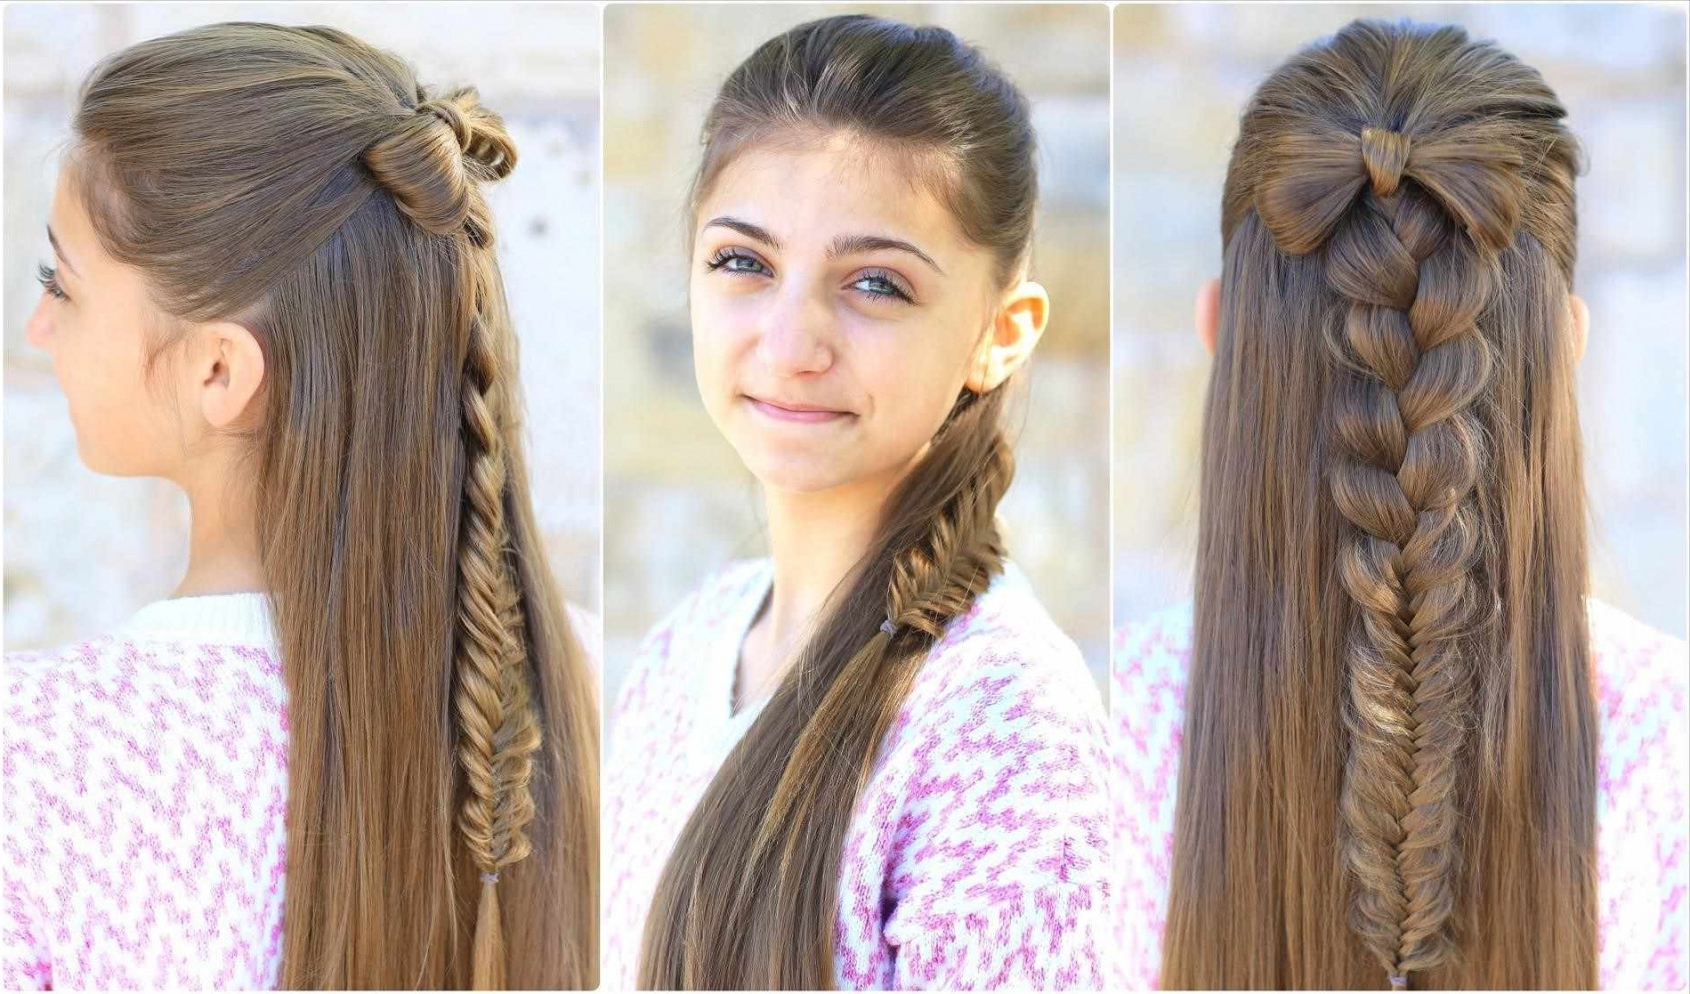 Preferred Easy Braided Hairstyles Regarding Cute And Easy Braided Hairstyles (View 9 of 15)